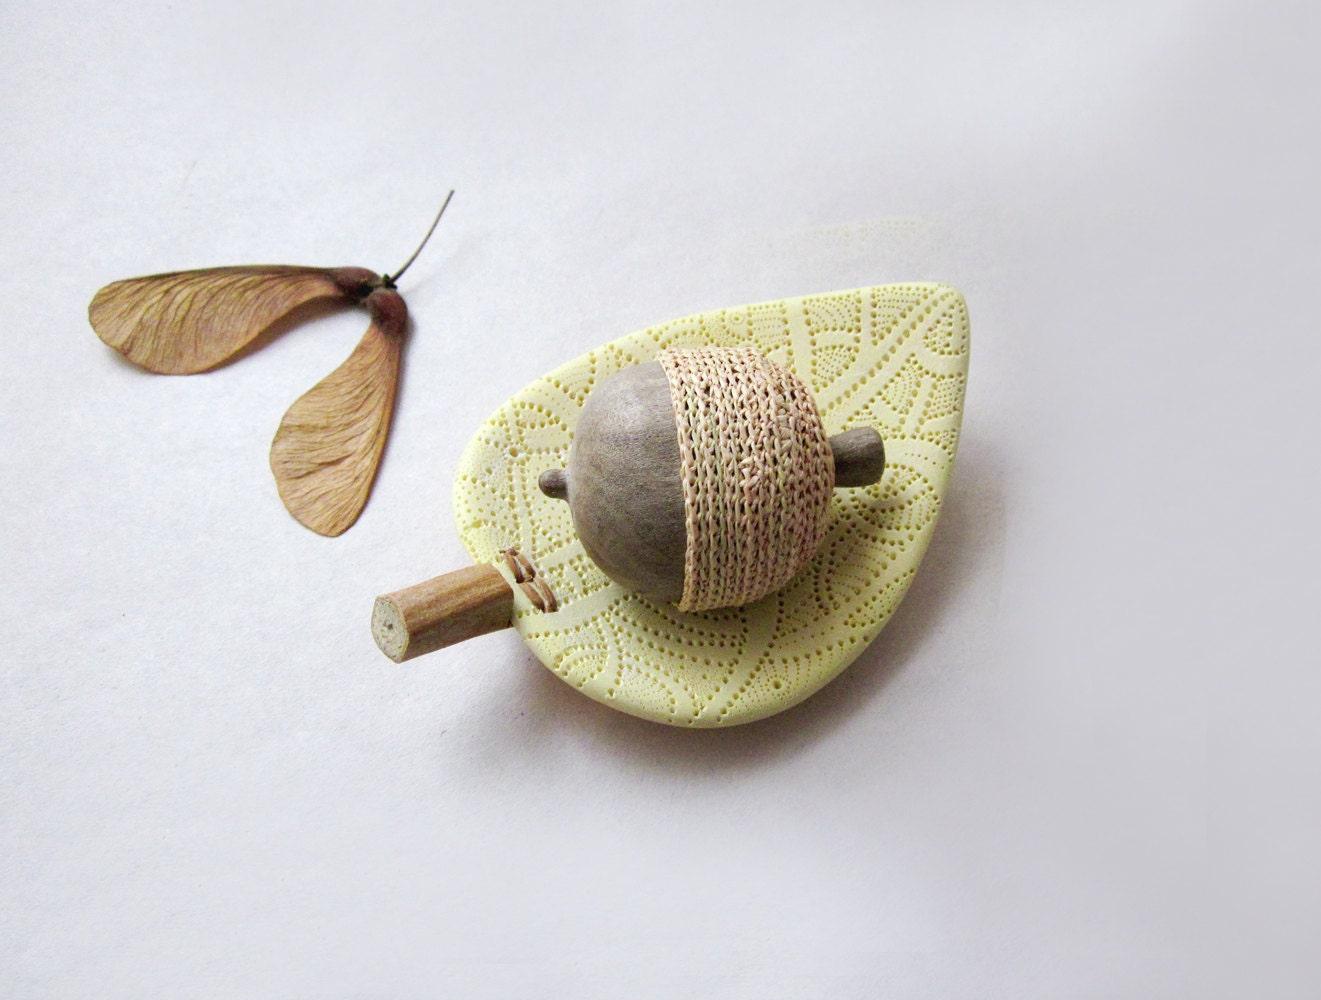 Hand sculpted acorn with a unique leaf bowl, Rustic home decor - plad